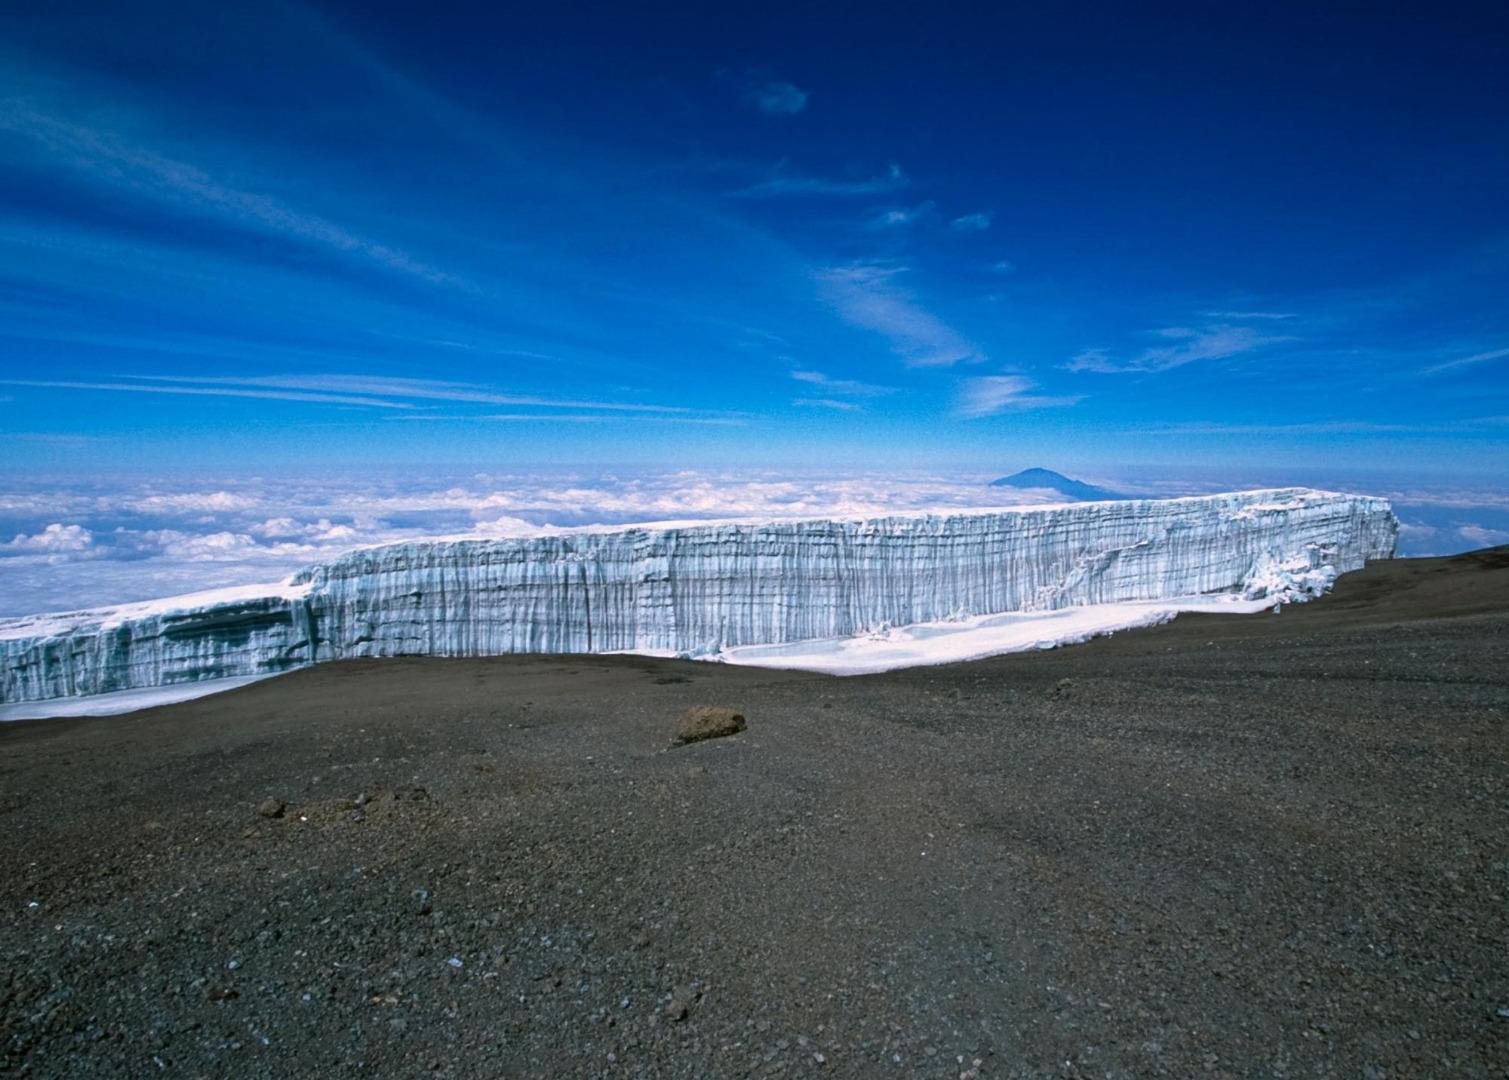 Mount Kilimanjaro Lemosho Route Adventure Alternative Expeditions Aviation Knee Key Systems Wiring Diagram